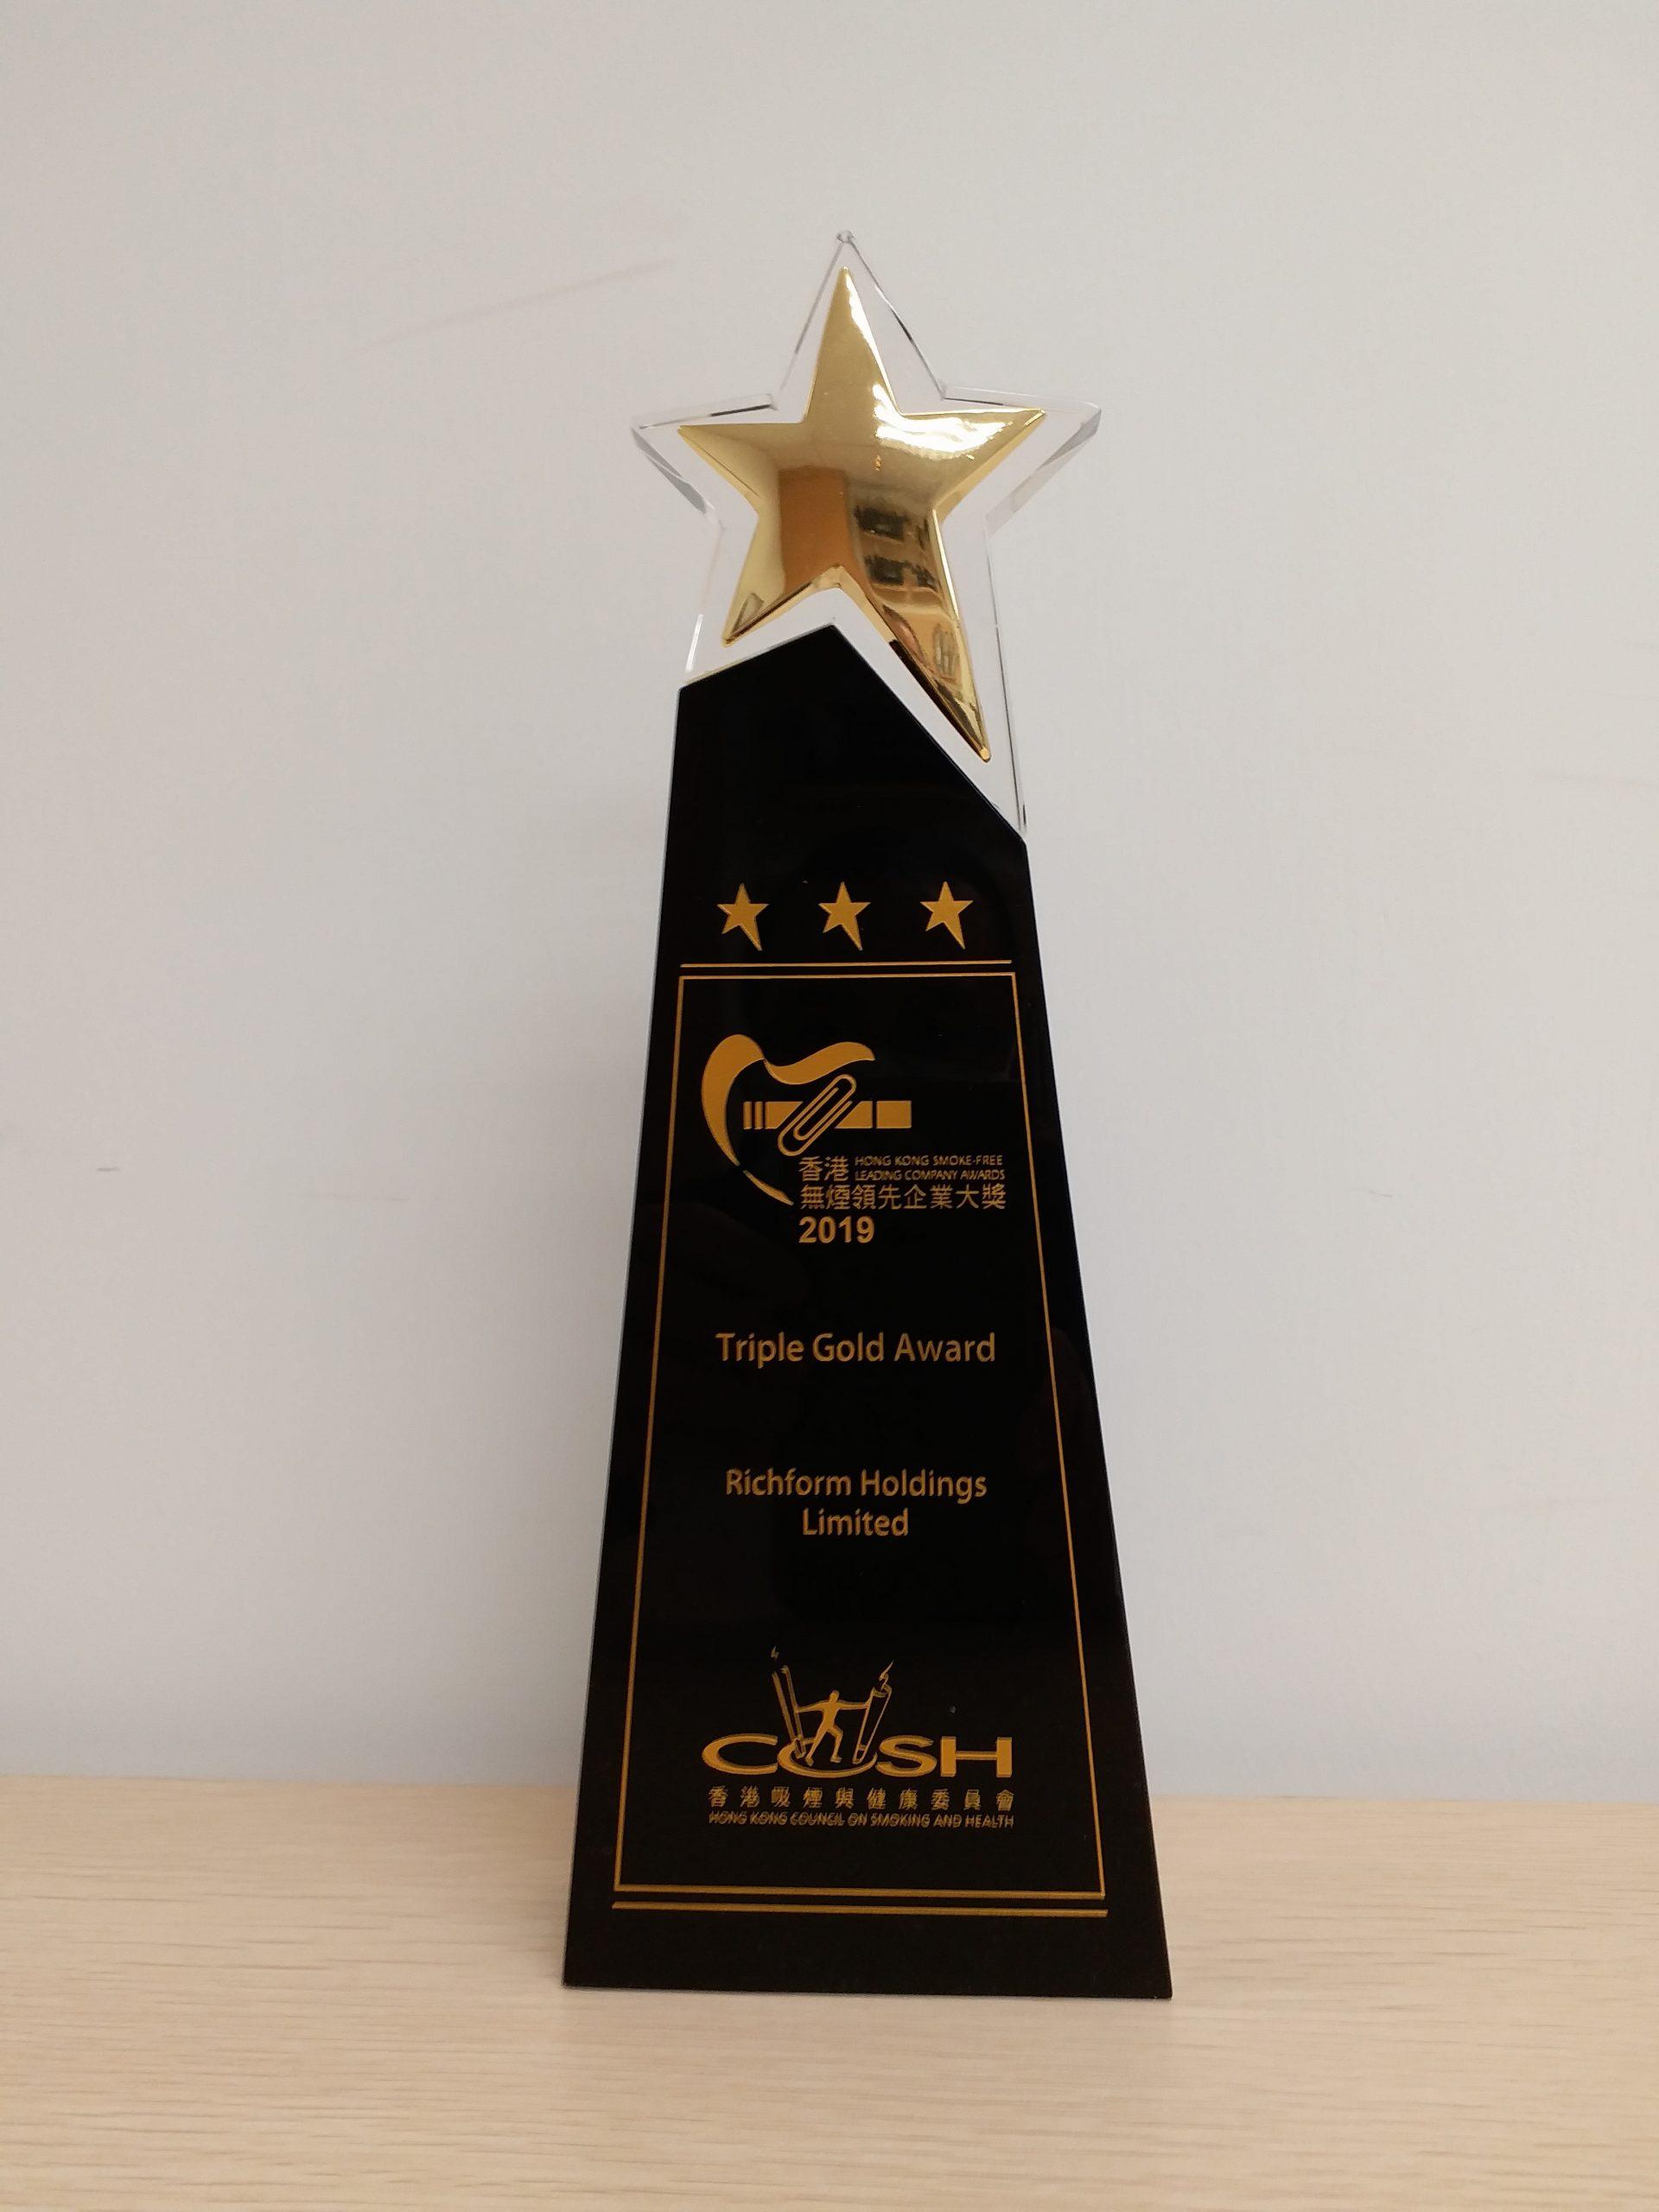 Hong Kong Smoke Free Leading Company Awards Triple Gold Award 2019